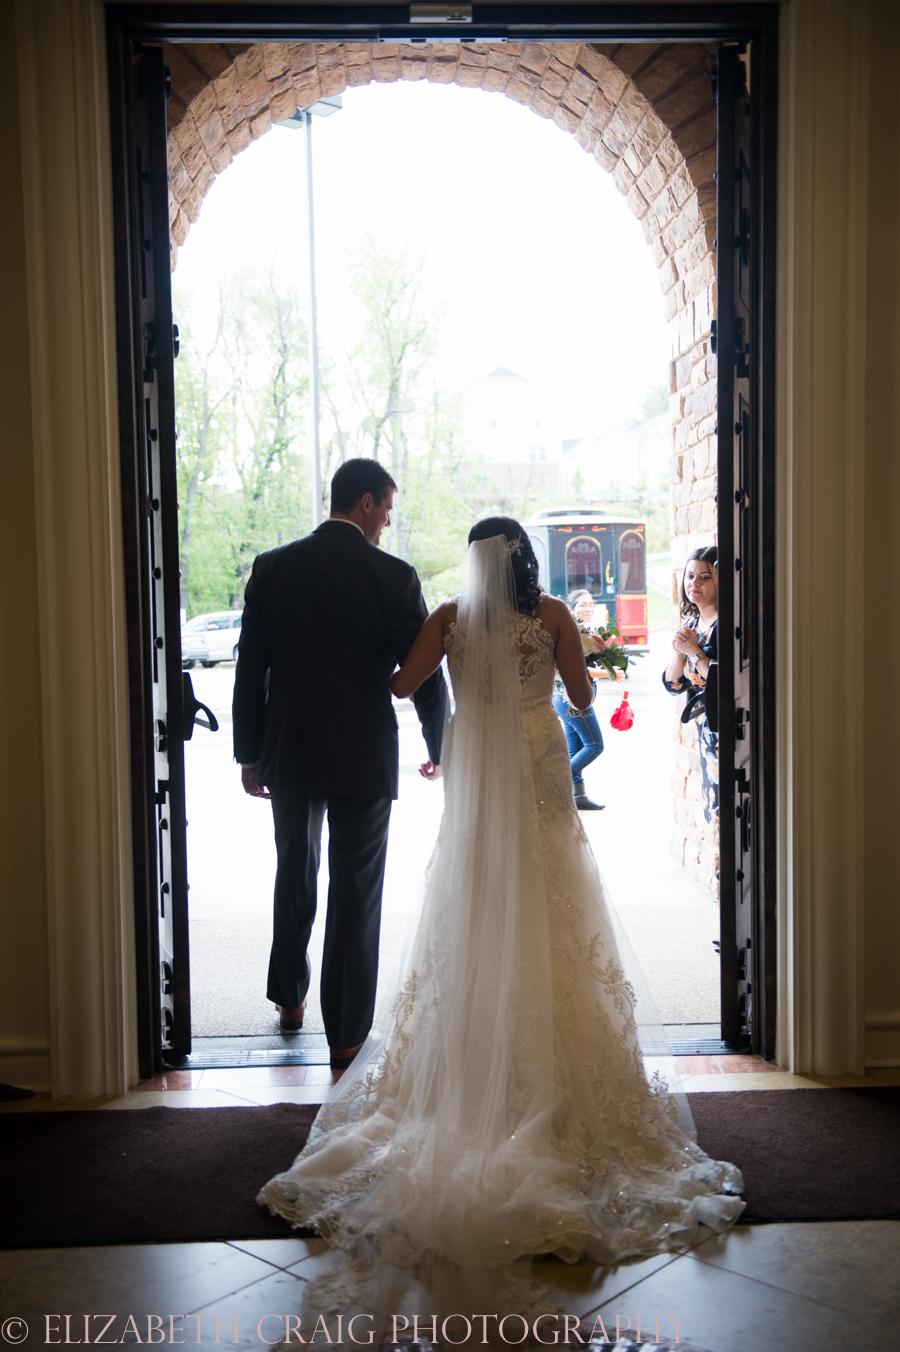 pittsburgh-greek-weddings-fairmont-weddings-receptions-elizabeth-craig-photohgraphy-012